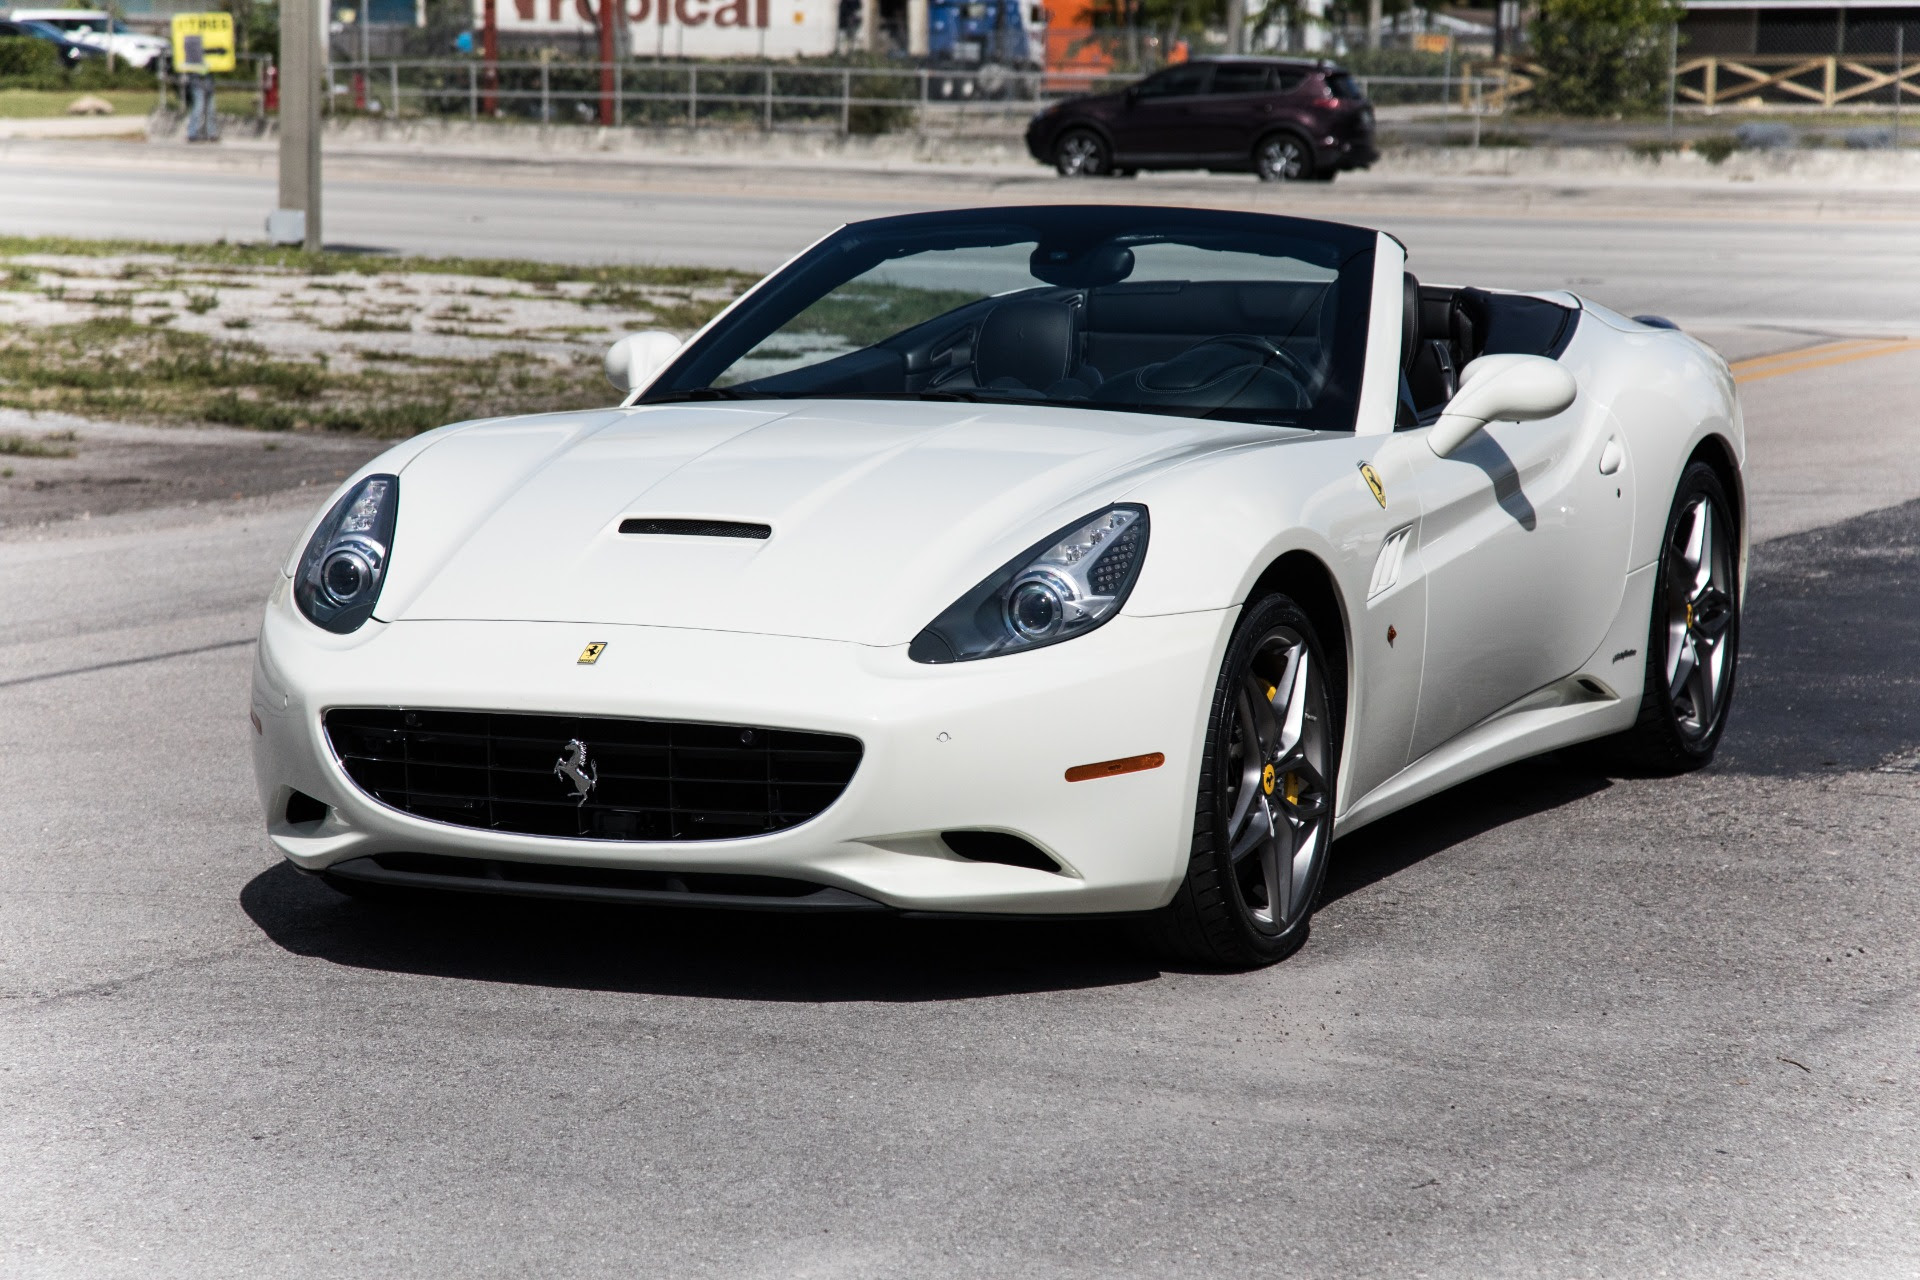 Used 2013 Ferrari California For Sale ($94,900) | Marino ...